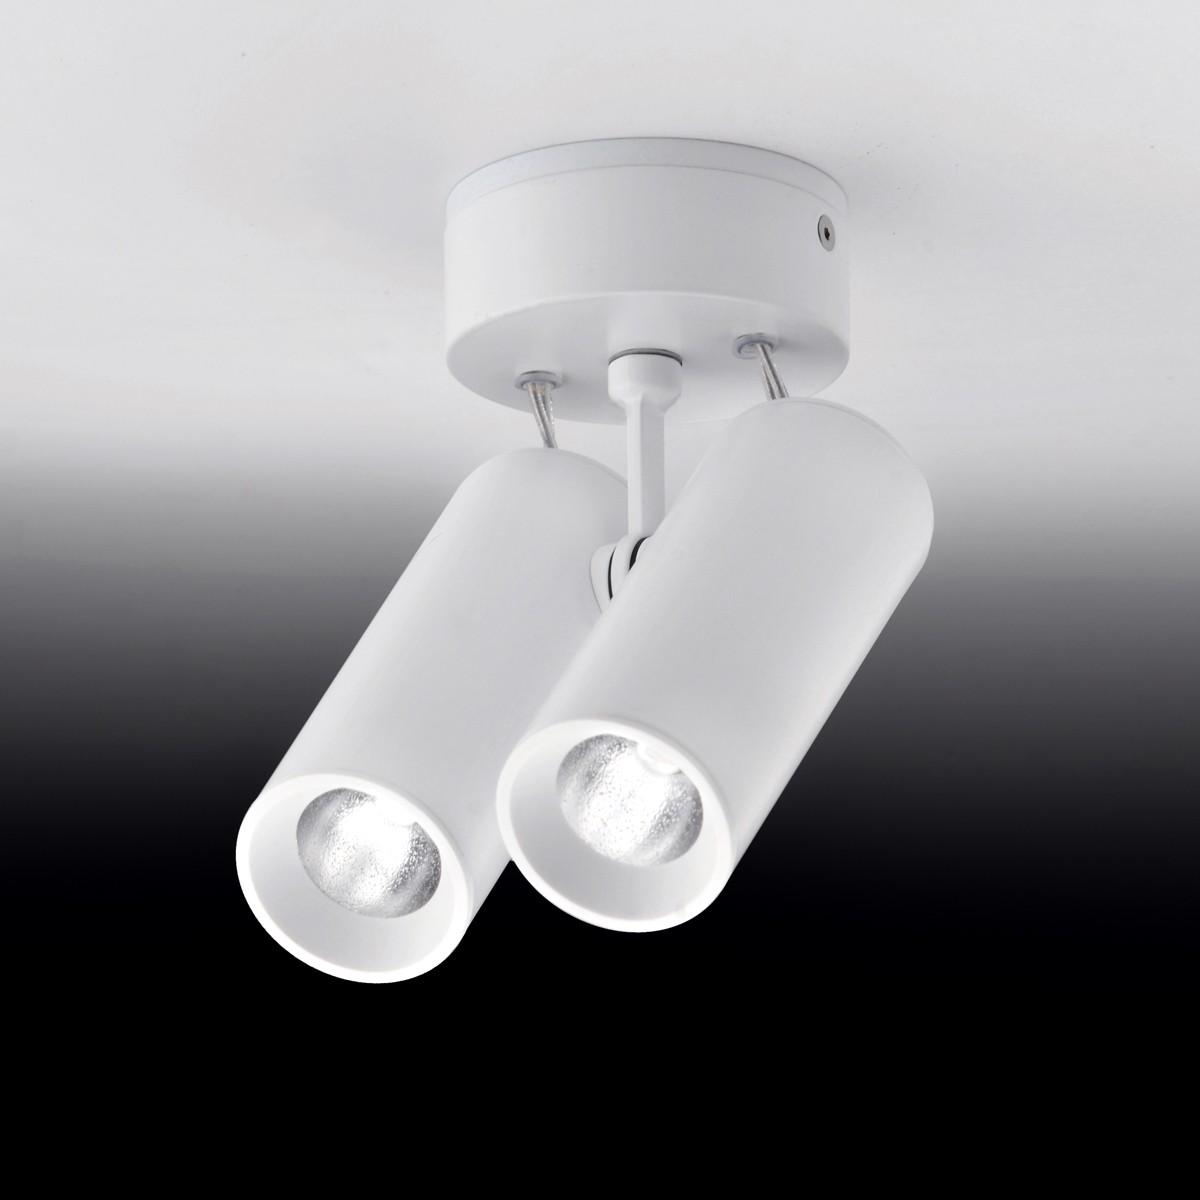 Milan Tub LED 632x Deckenstrahler, 2-flg., weiß lackiert